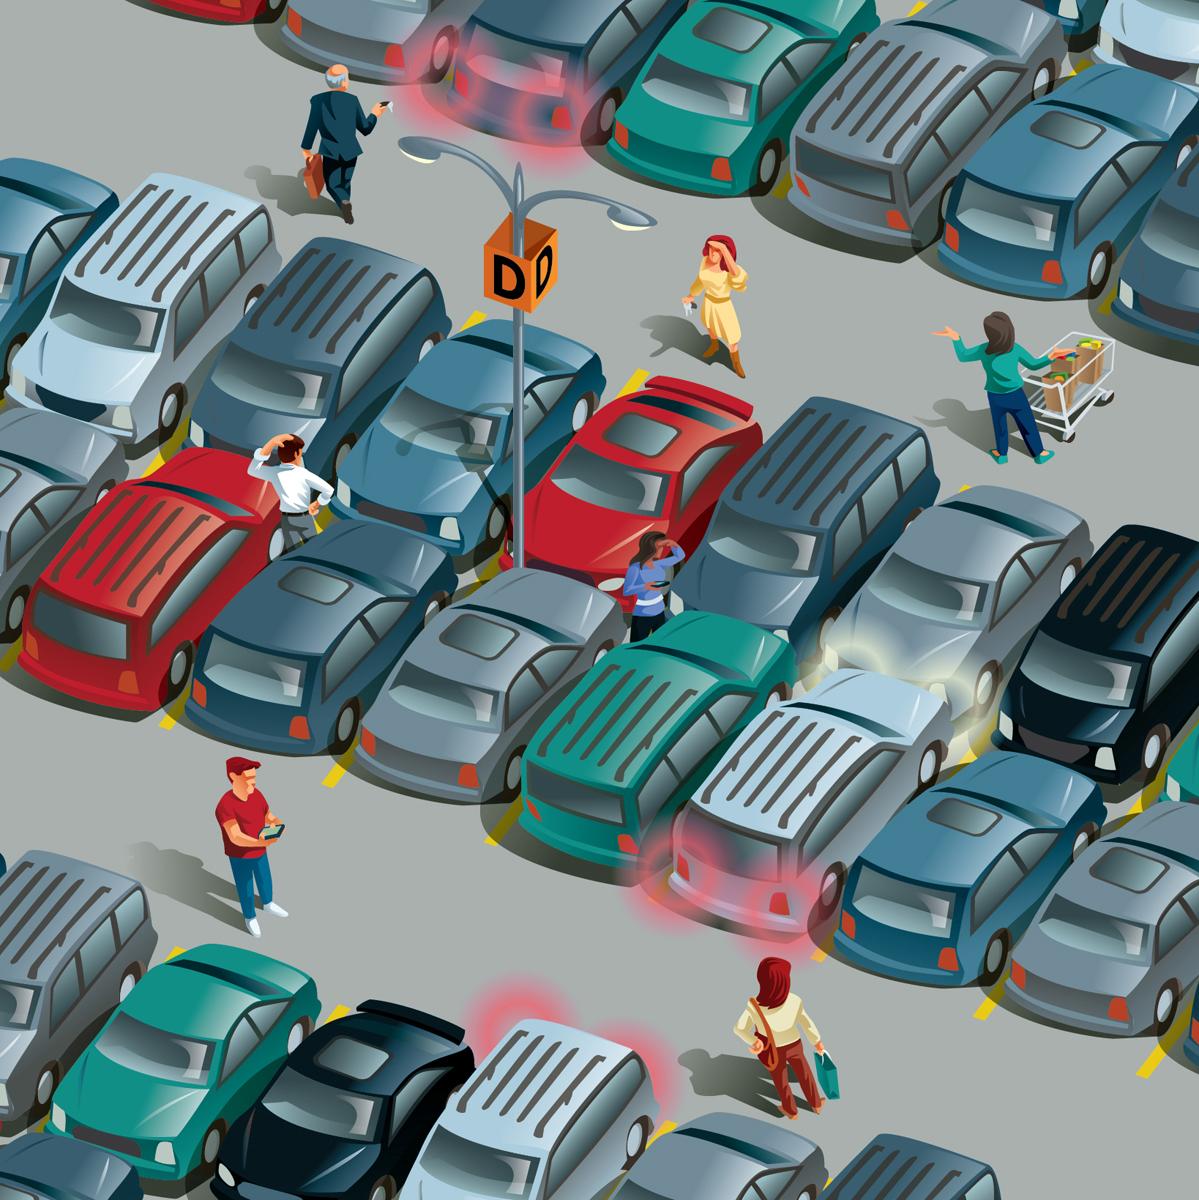 Wall Street Journal Parking Lot Illustra